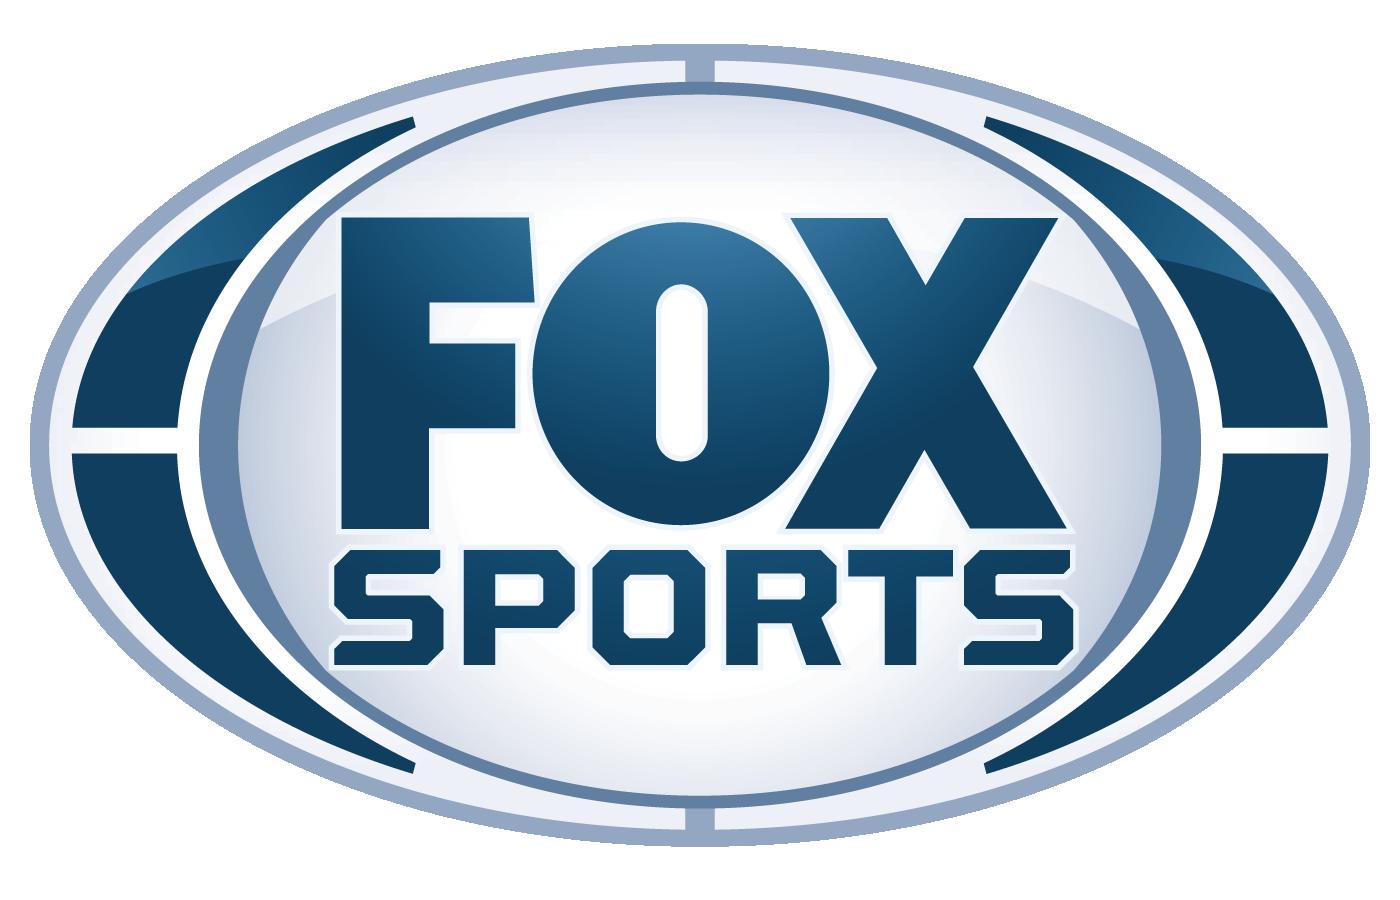 FOX Sports Launches Fifth Fully Electric FIA Formula E